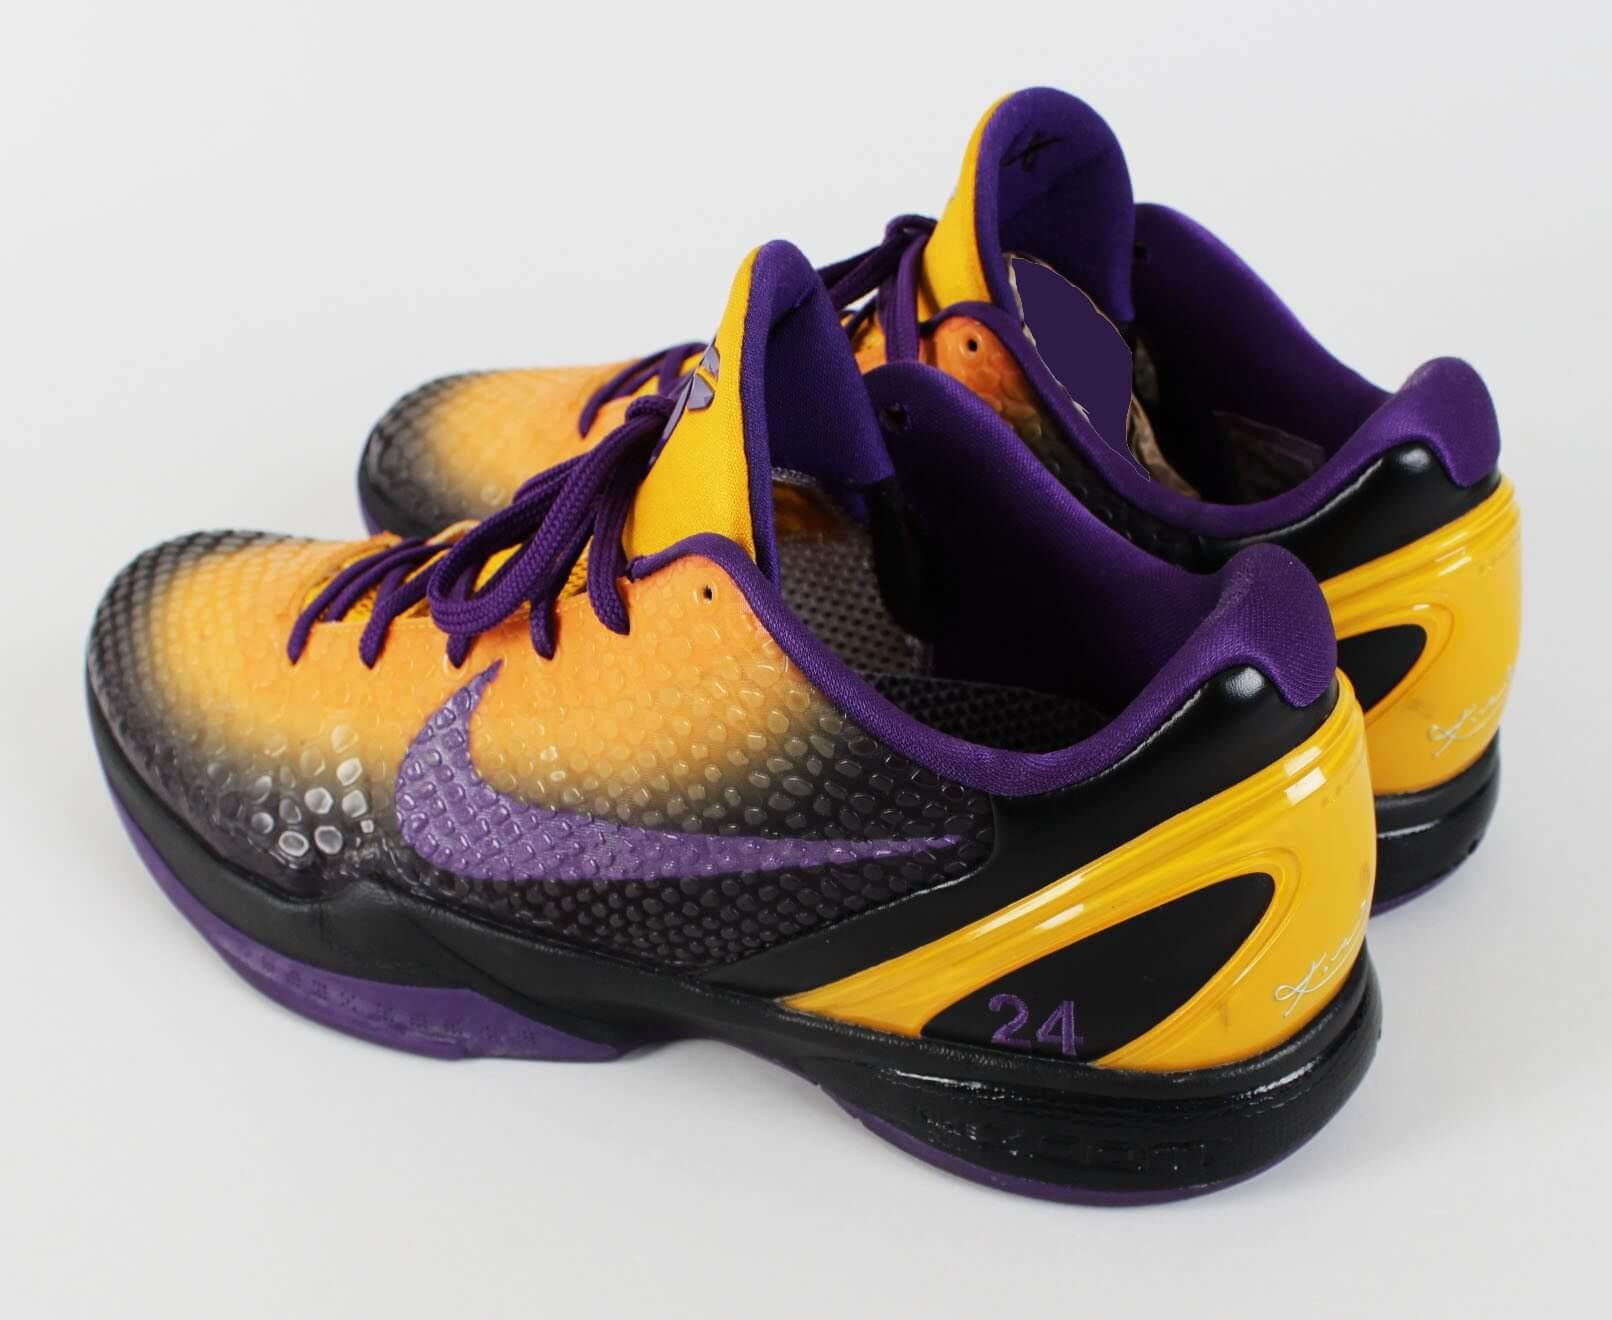 2010-11 Los Angeles Lakers - Kobe Bryant Worn Shoes Custom Mamba Snake NIKE iD Zoom VI Sneakers   Memorabilia Expert